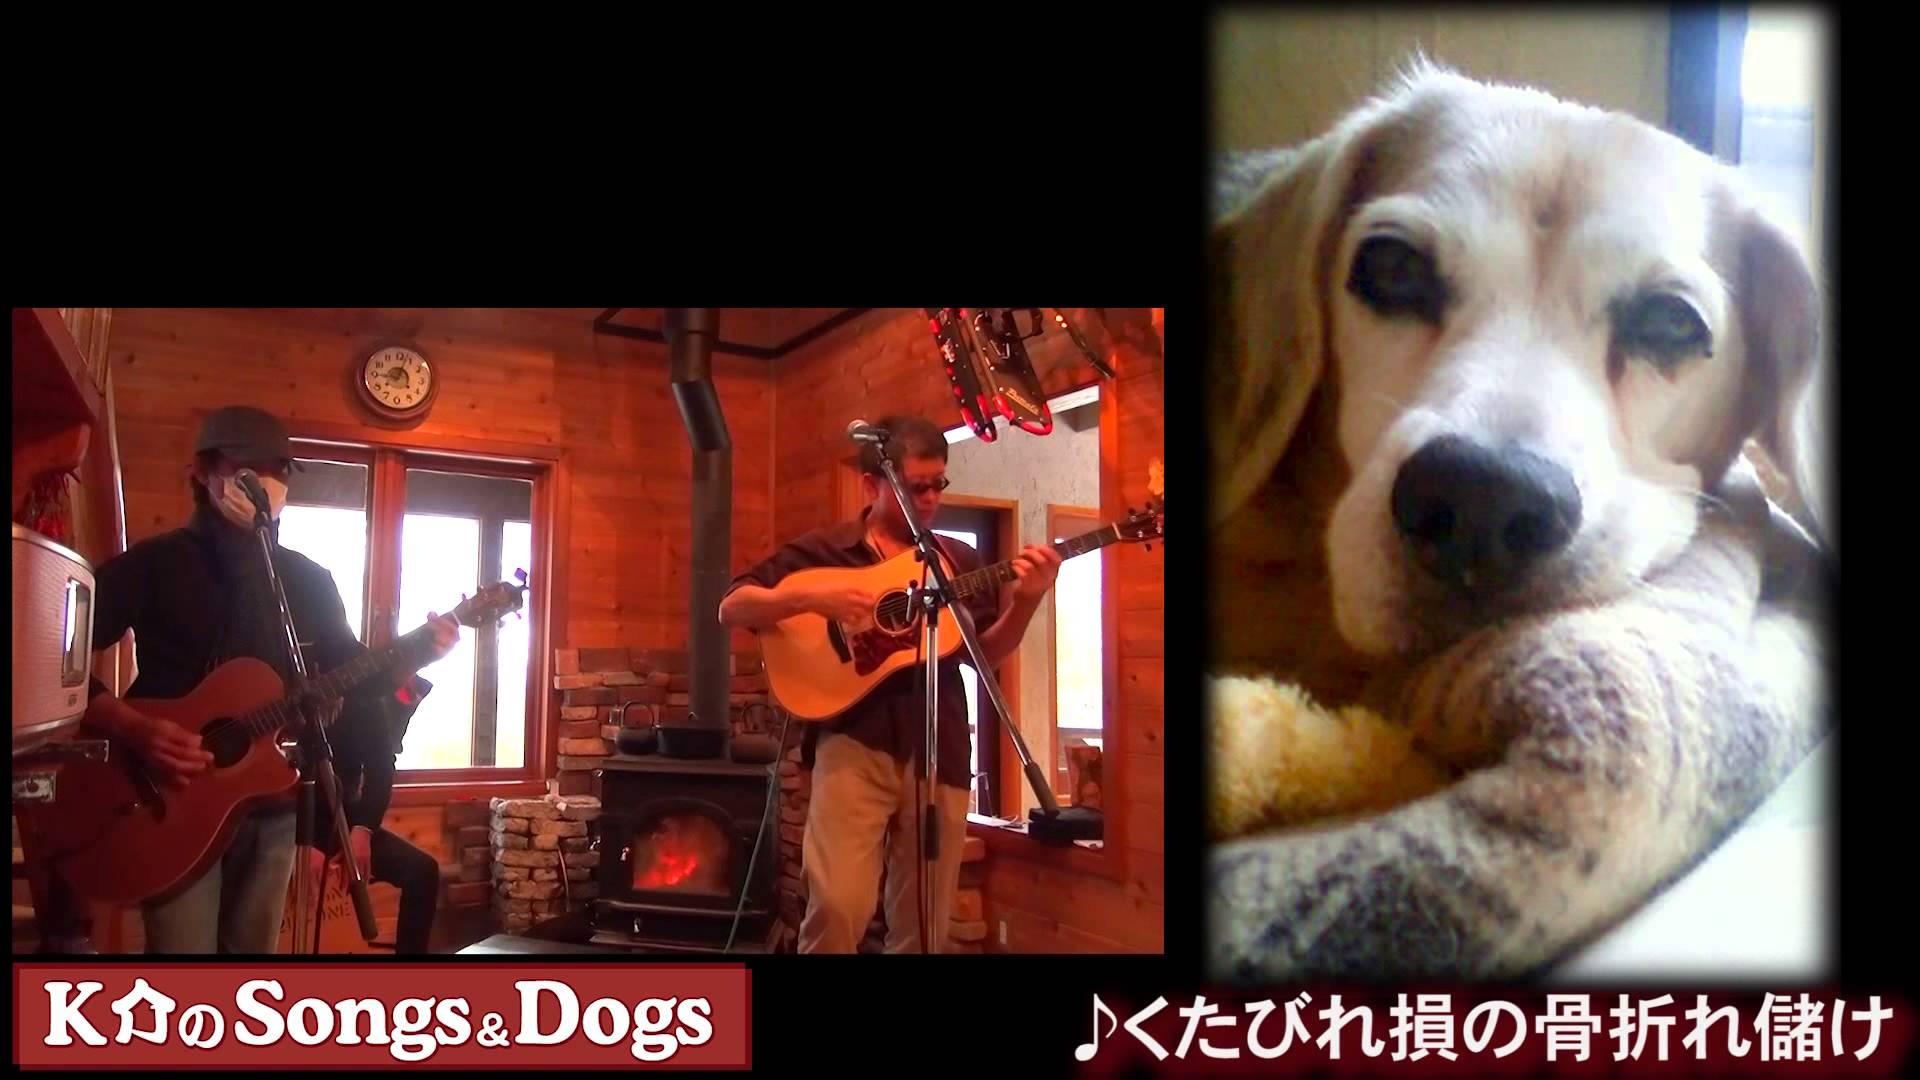 K介のSongs&Dogs週末はミュージシャン~49